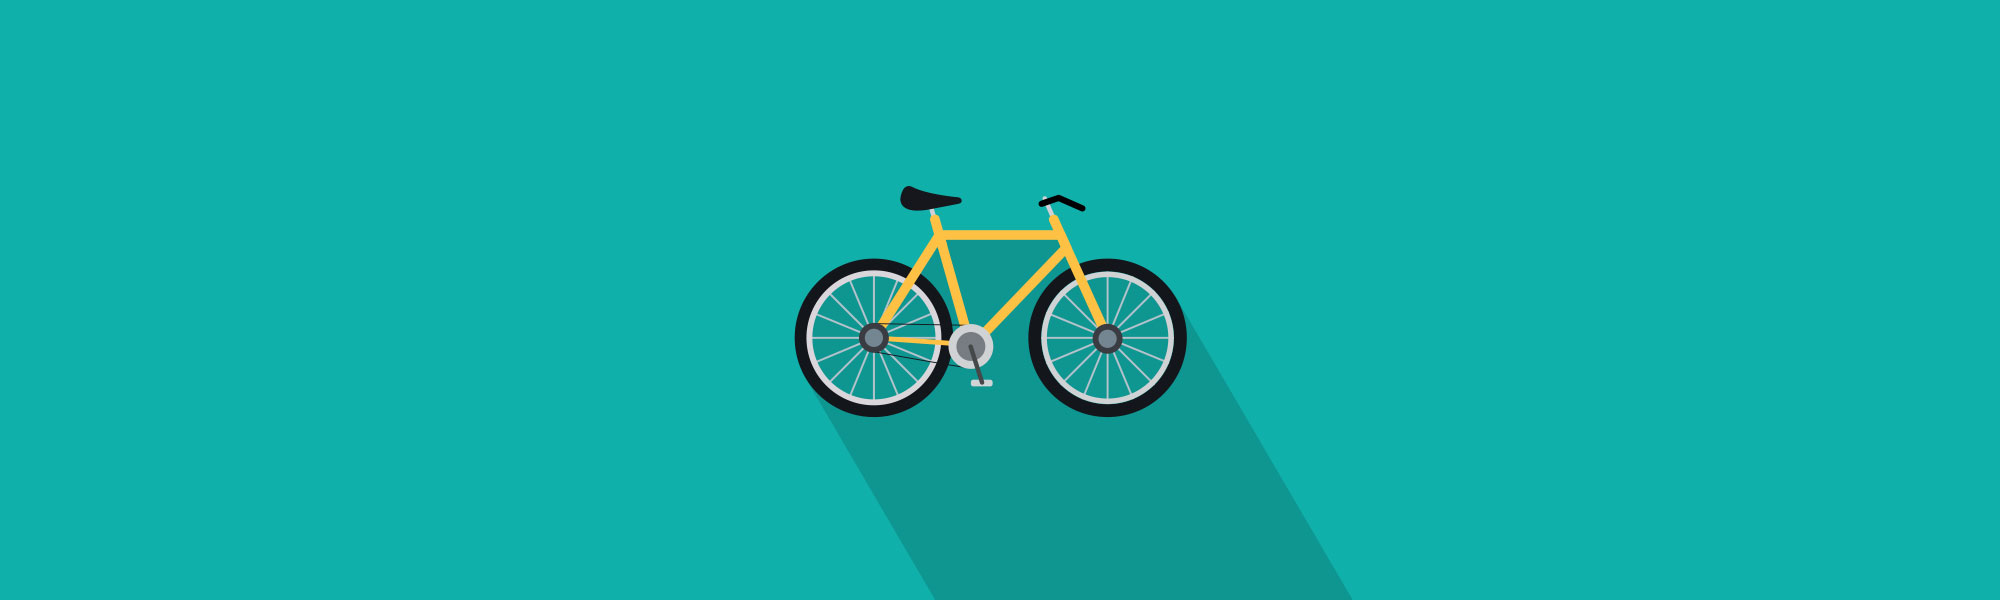 Full width banner hire a bike